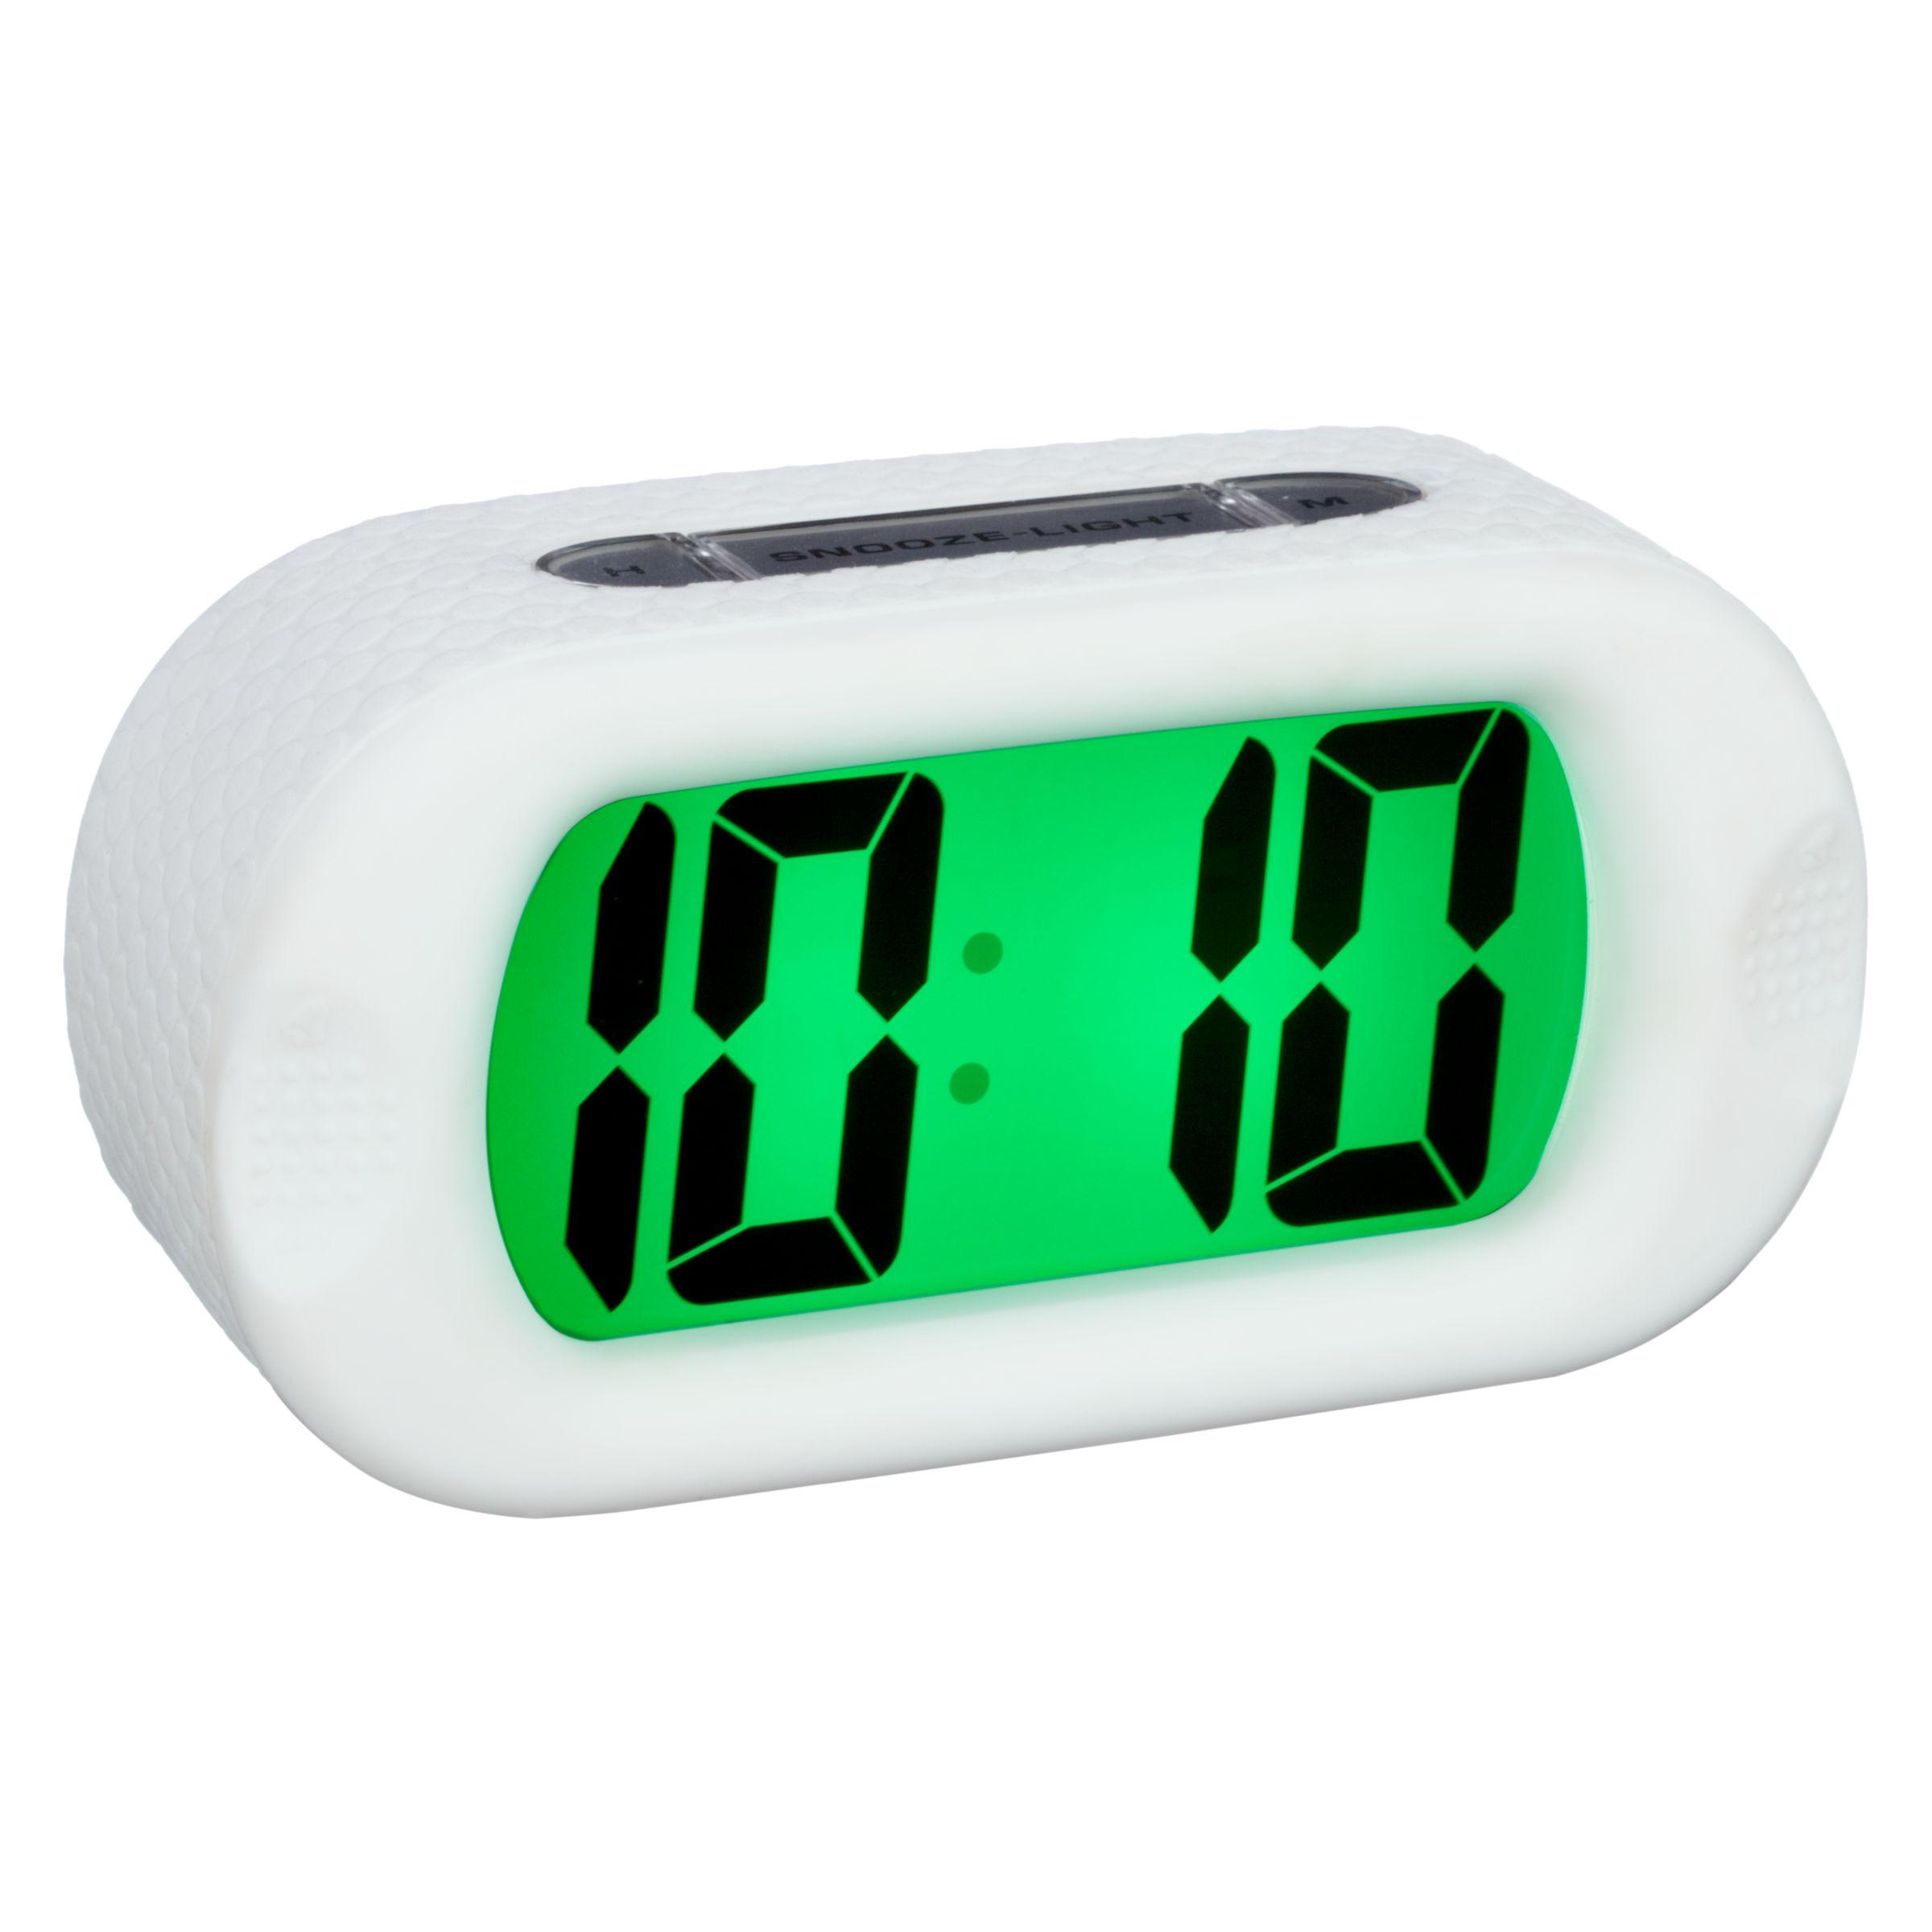 Acctim Acctim Silicone Jumbo LCD Smartlite® Alarm Clock